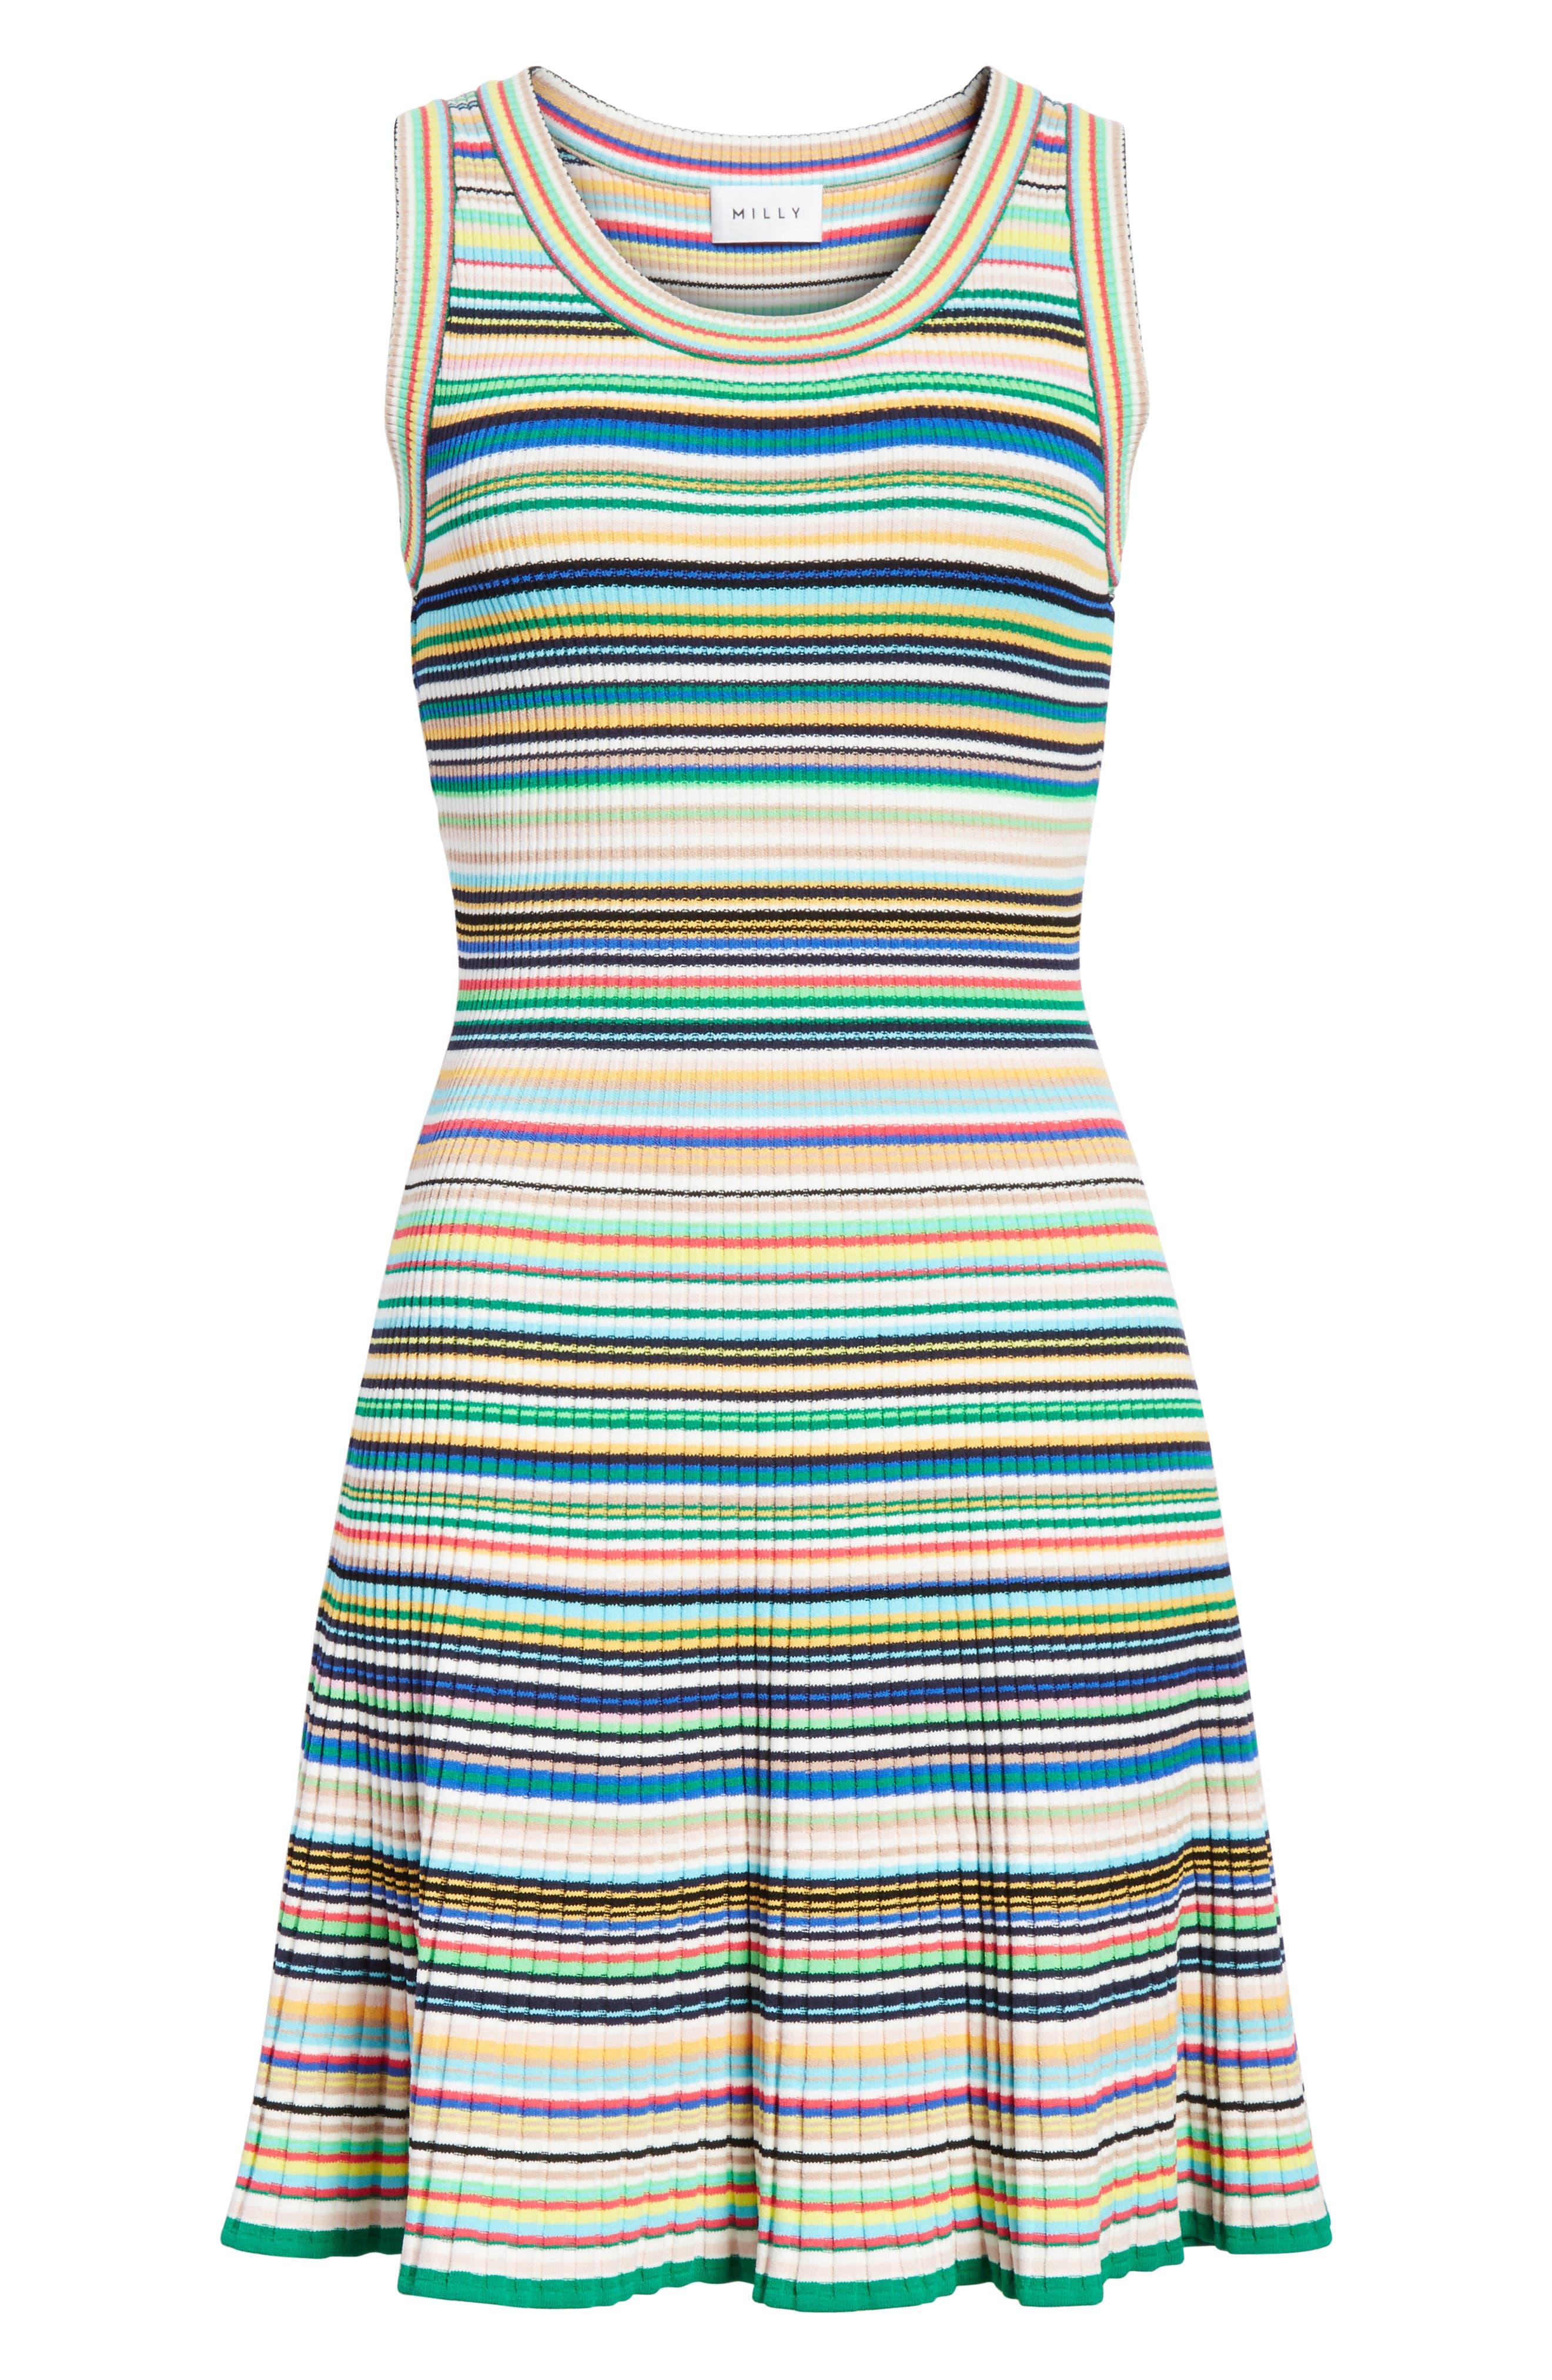 Microstripe Knit Fit & Flare Dress,                             Alternate thumbnail 6, color,                             367